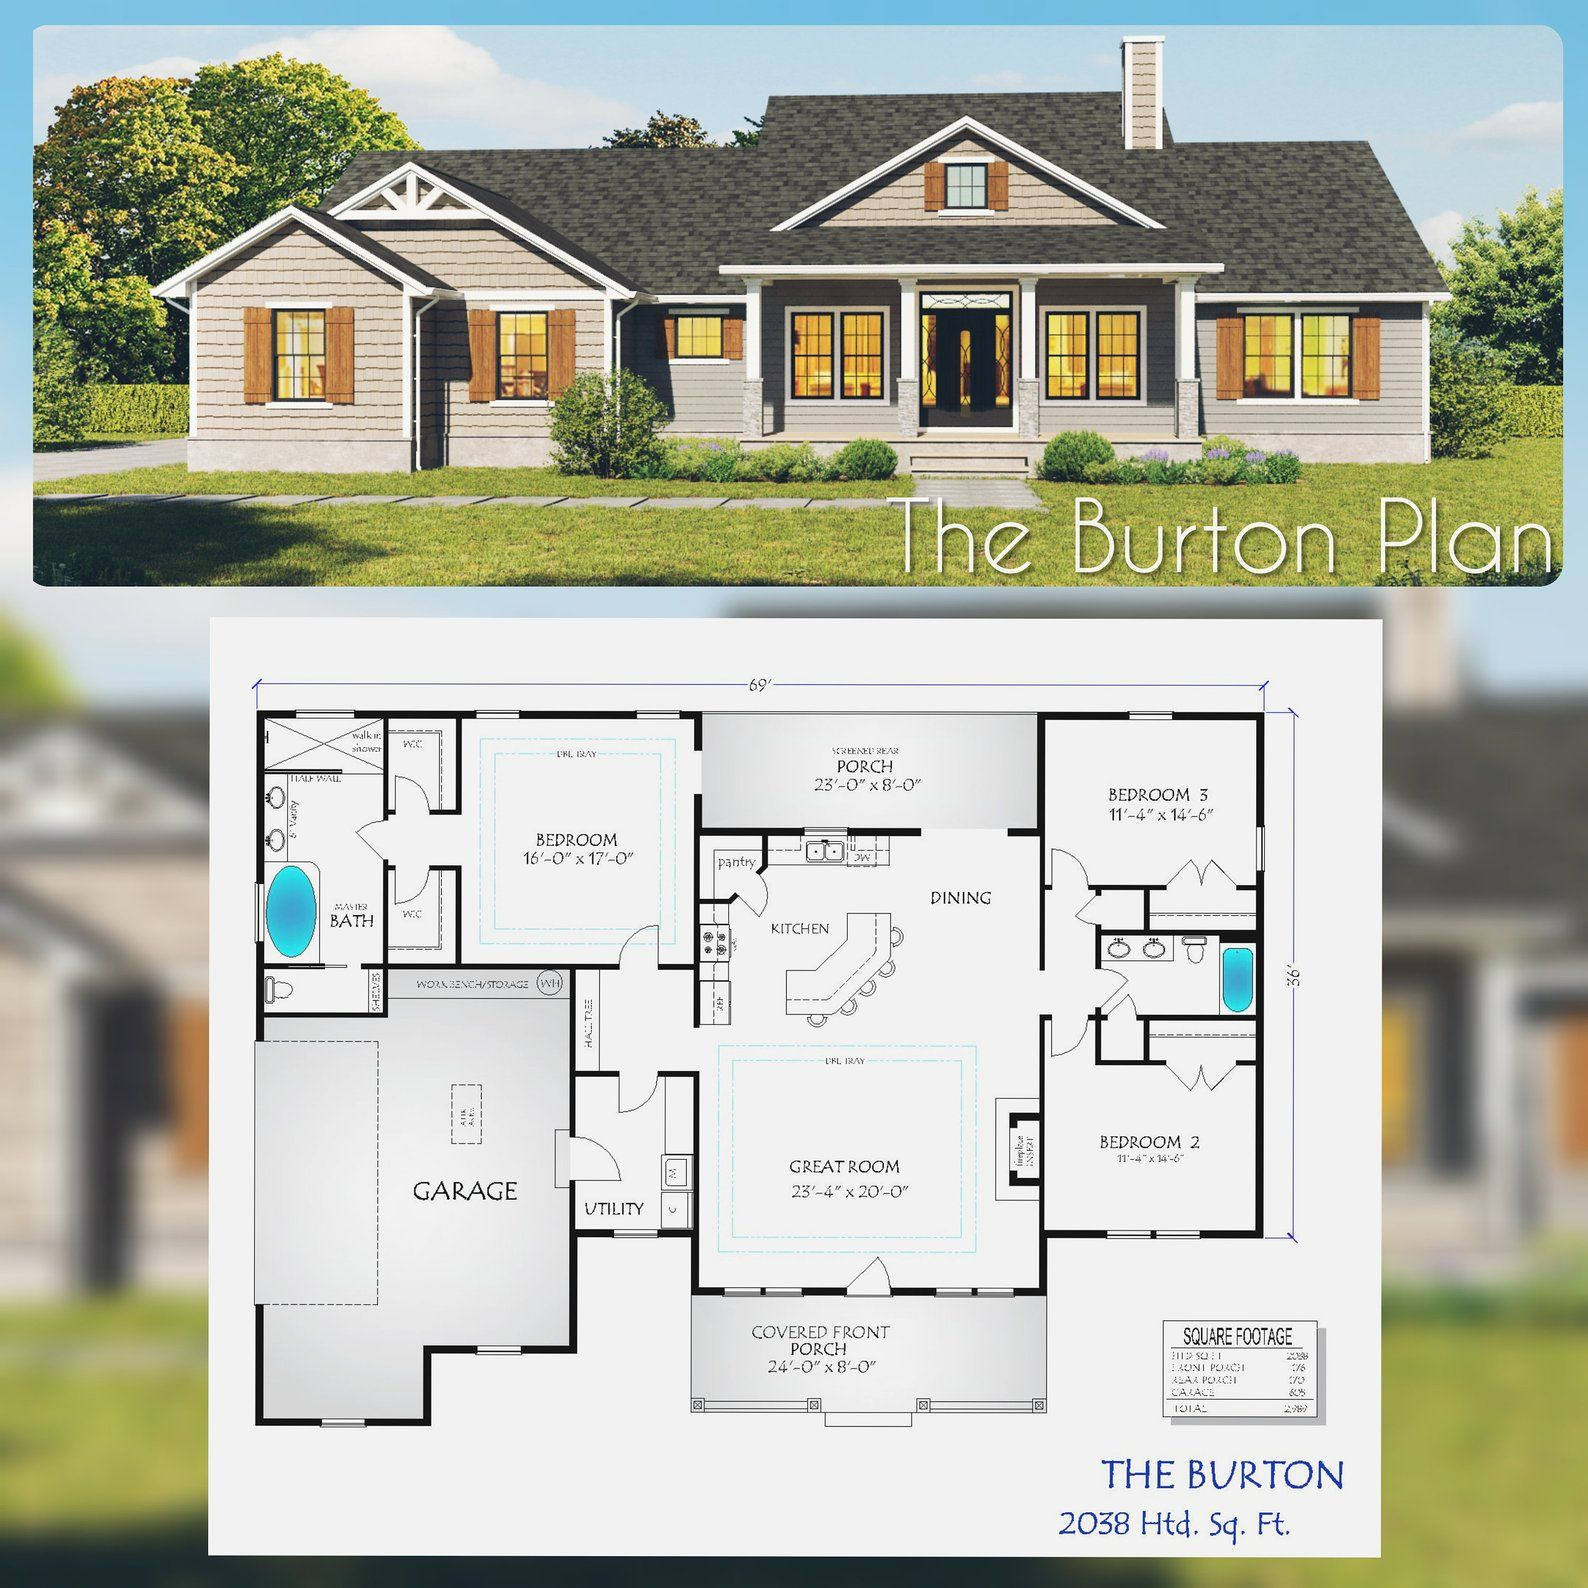 Craftsman House Plan The Burton Dream House Plans New House Plans Bedroom House Plans